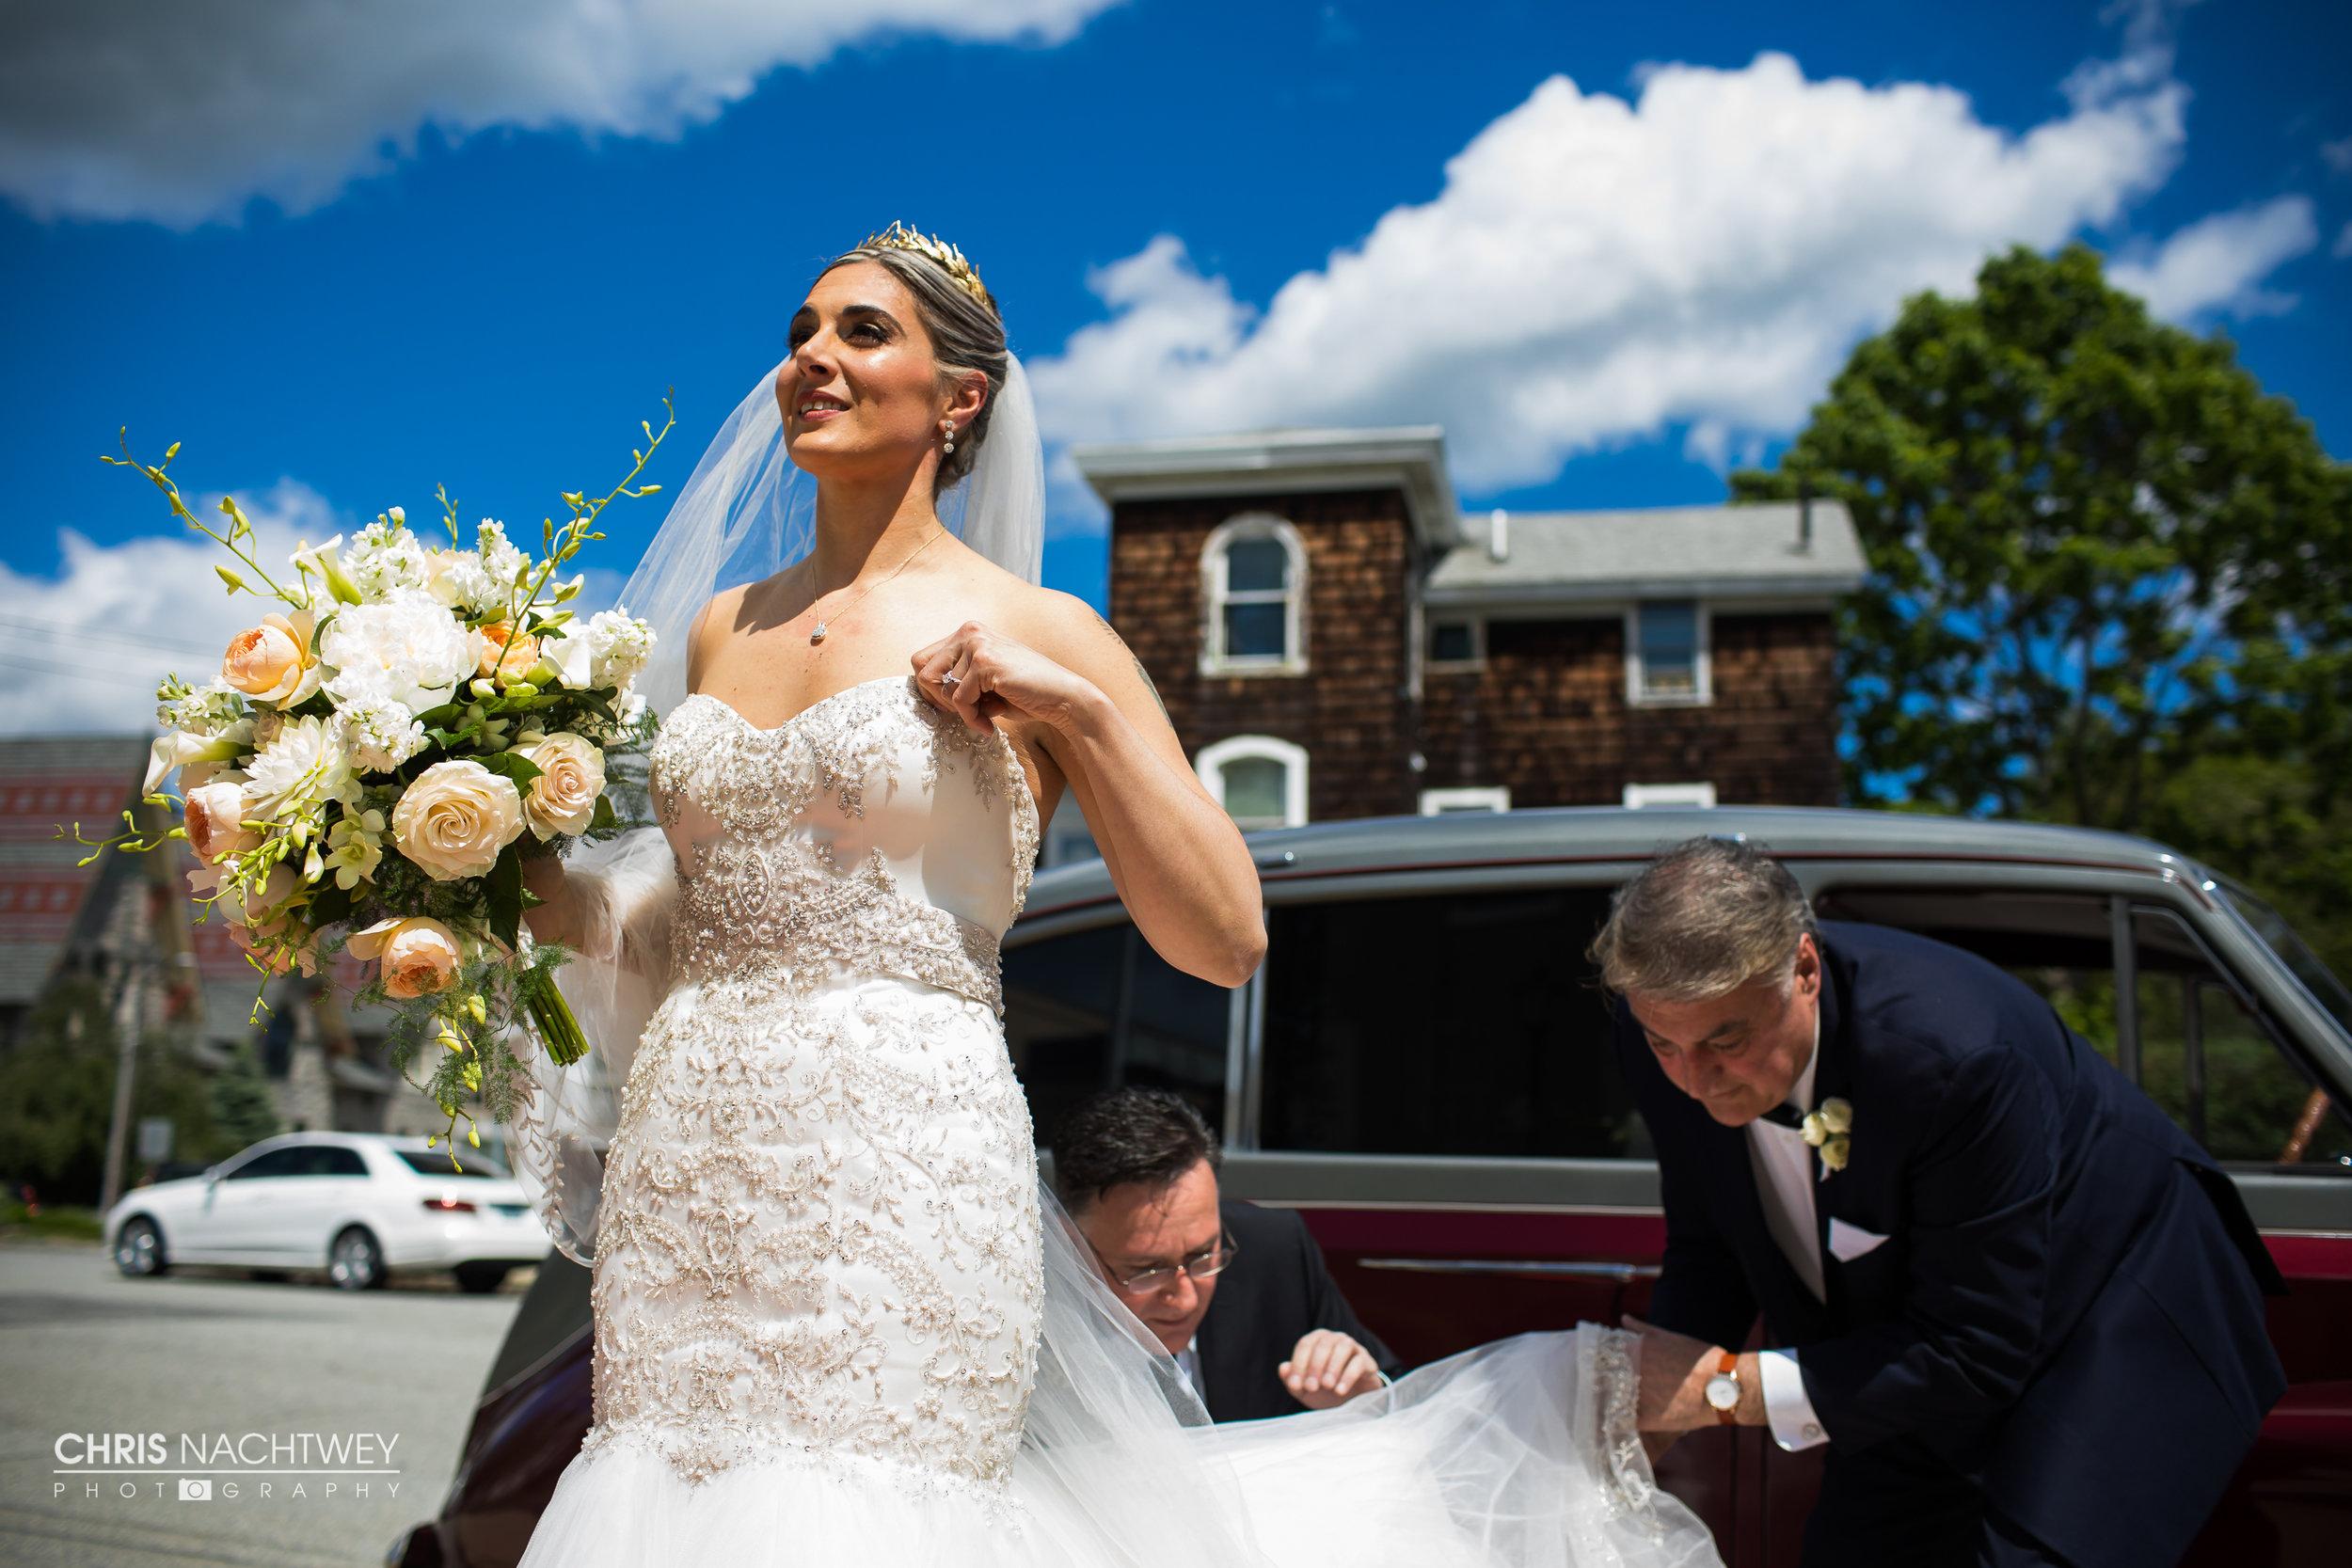 mystic-artistic-wedding-photographer-chris-nachtwey-2017-8.jpg